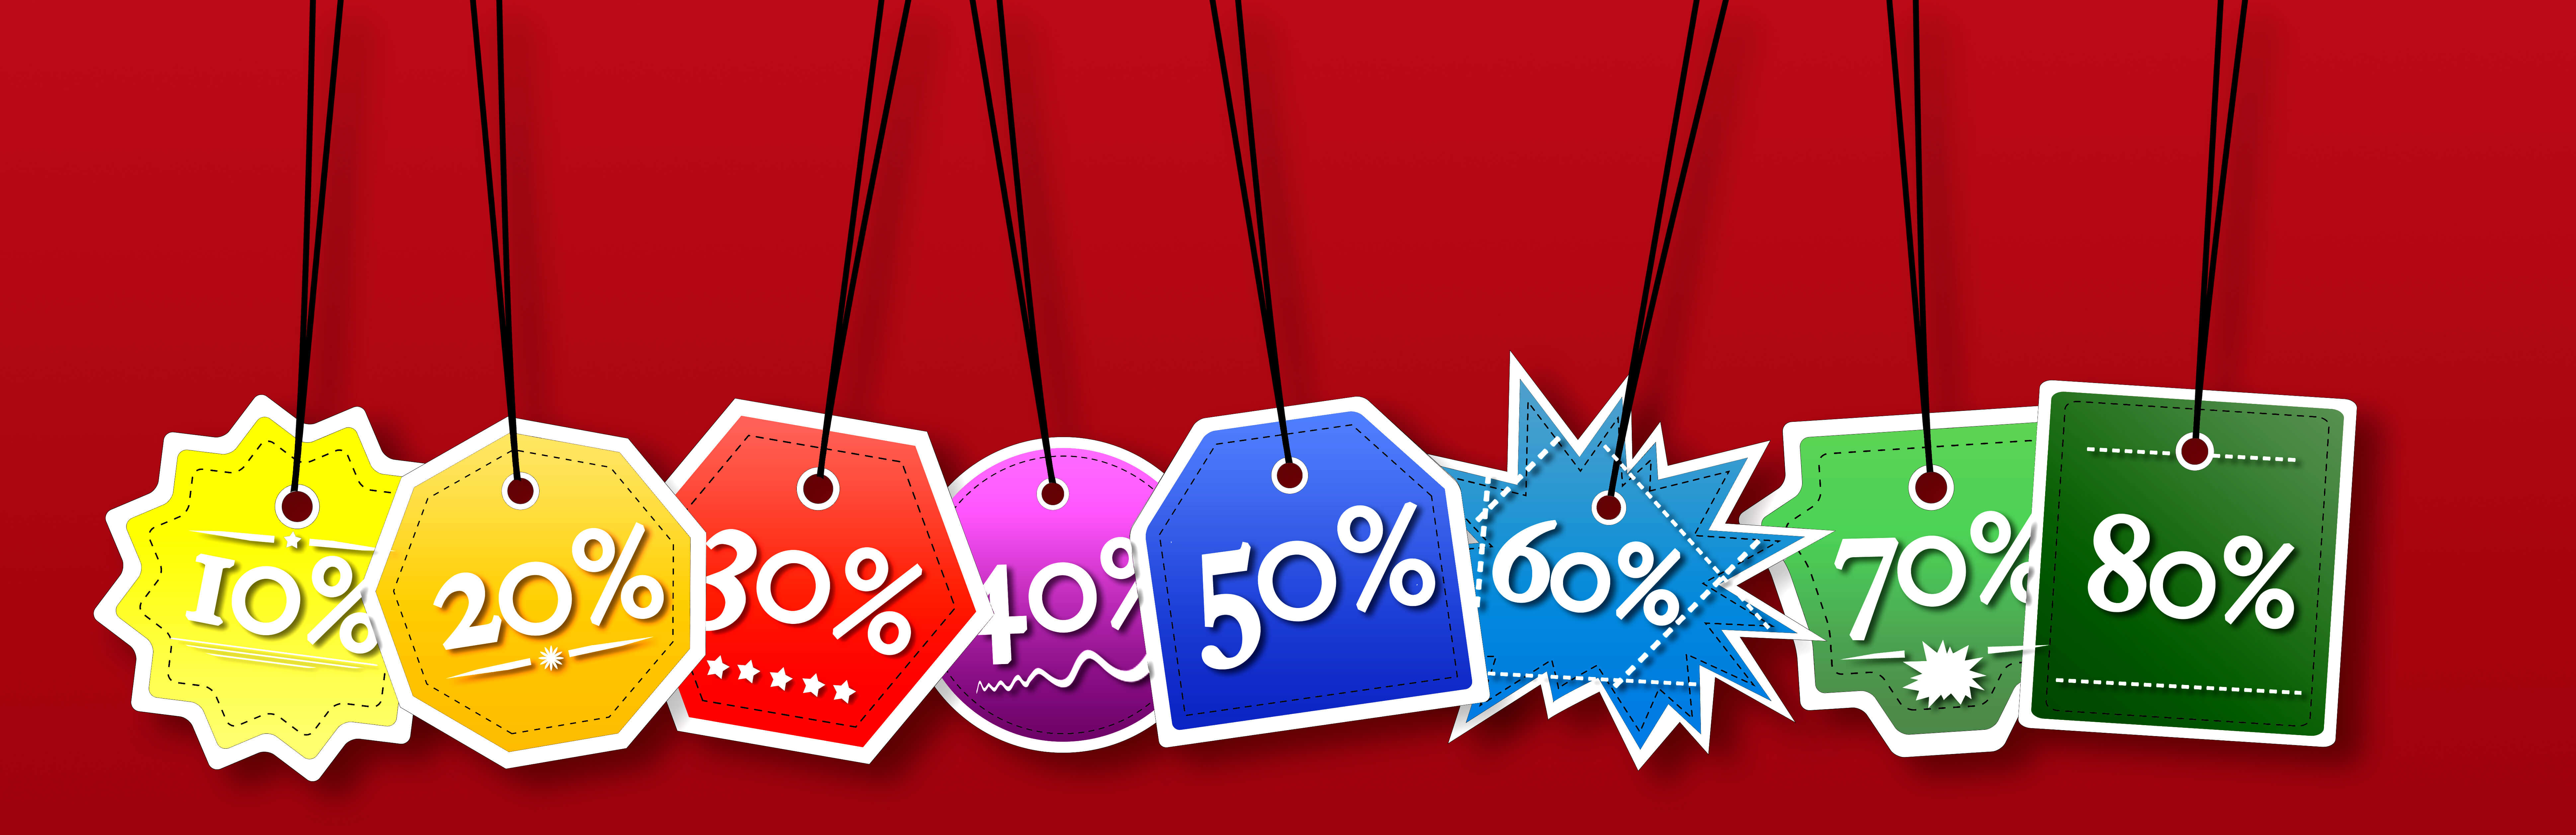 cumparatori, creditul viva, 0% dobanda